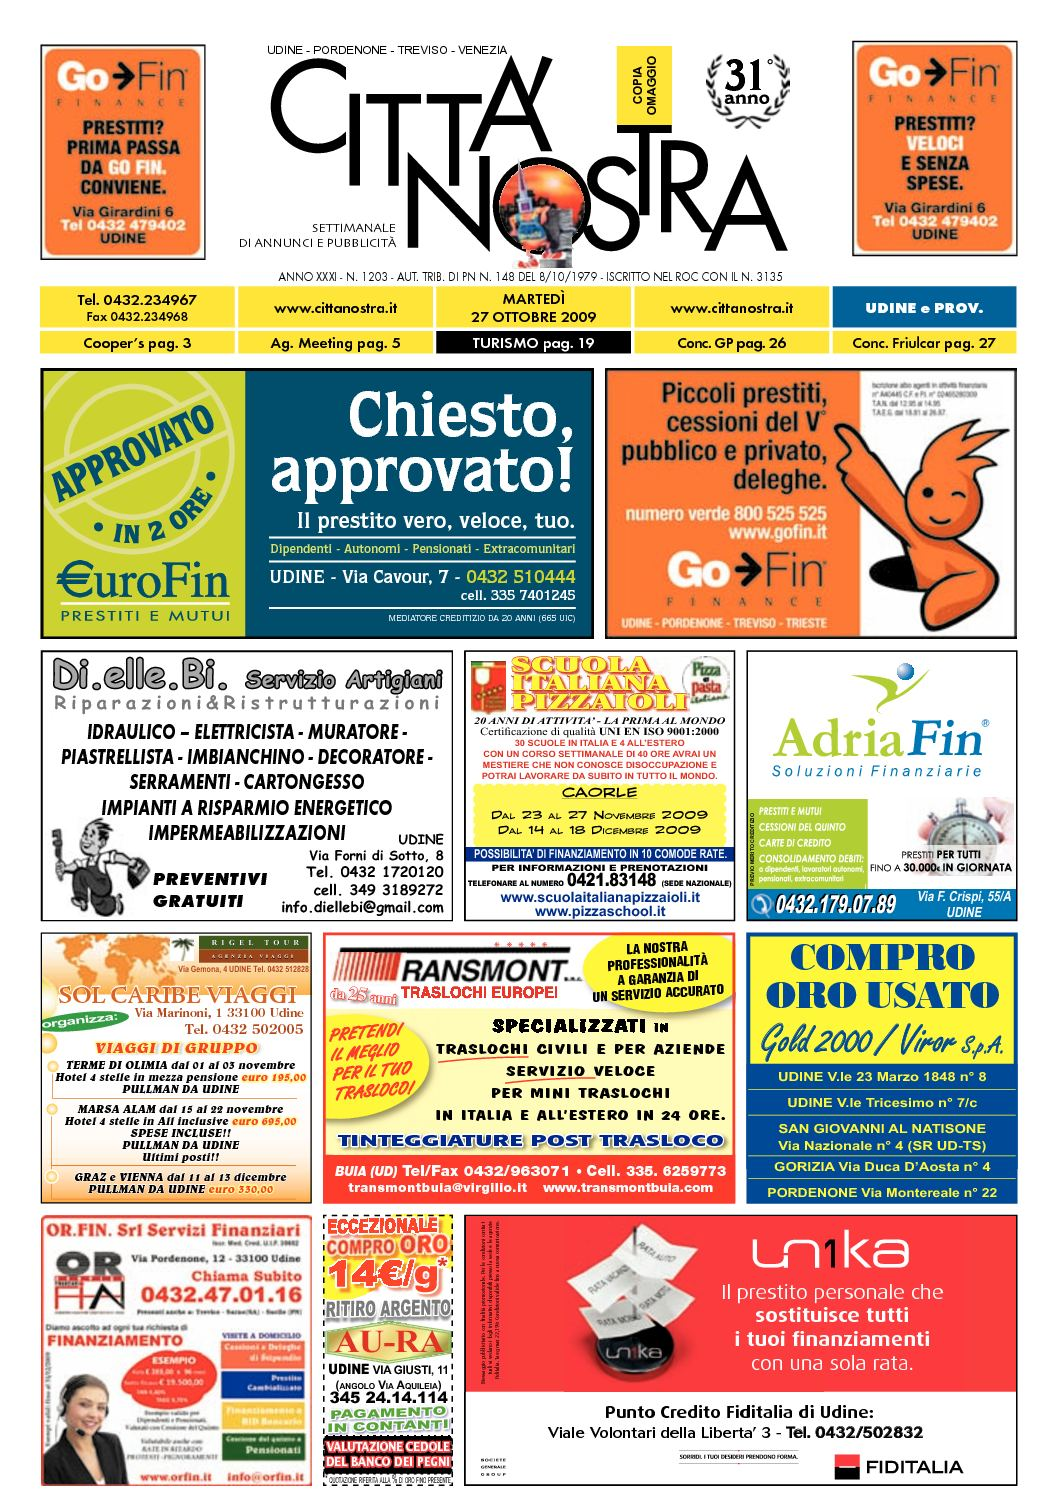 Calaméo Citt Nostra Udine Del 27 10 2009 N 1203